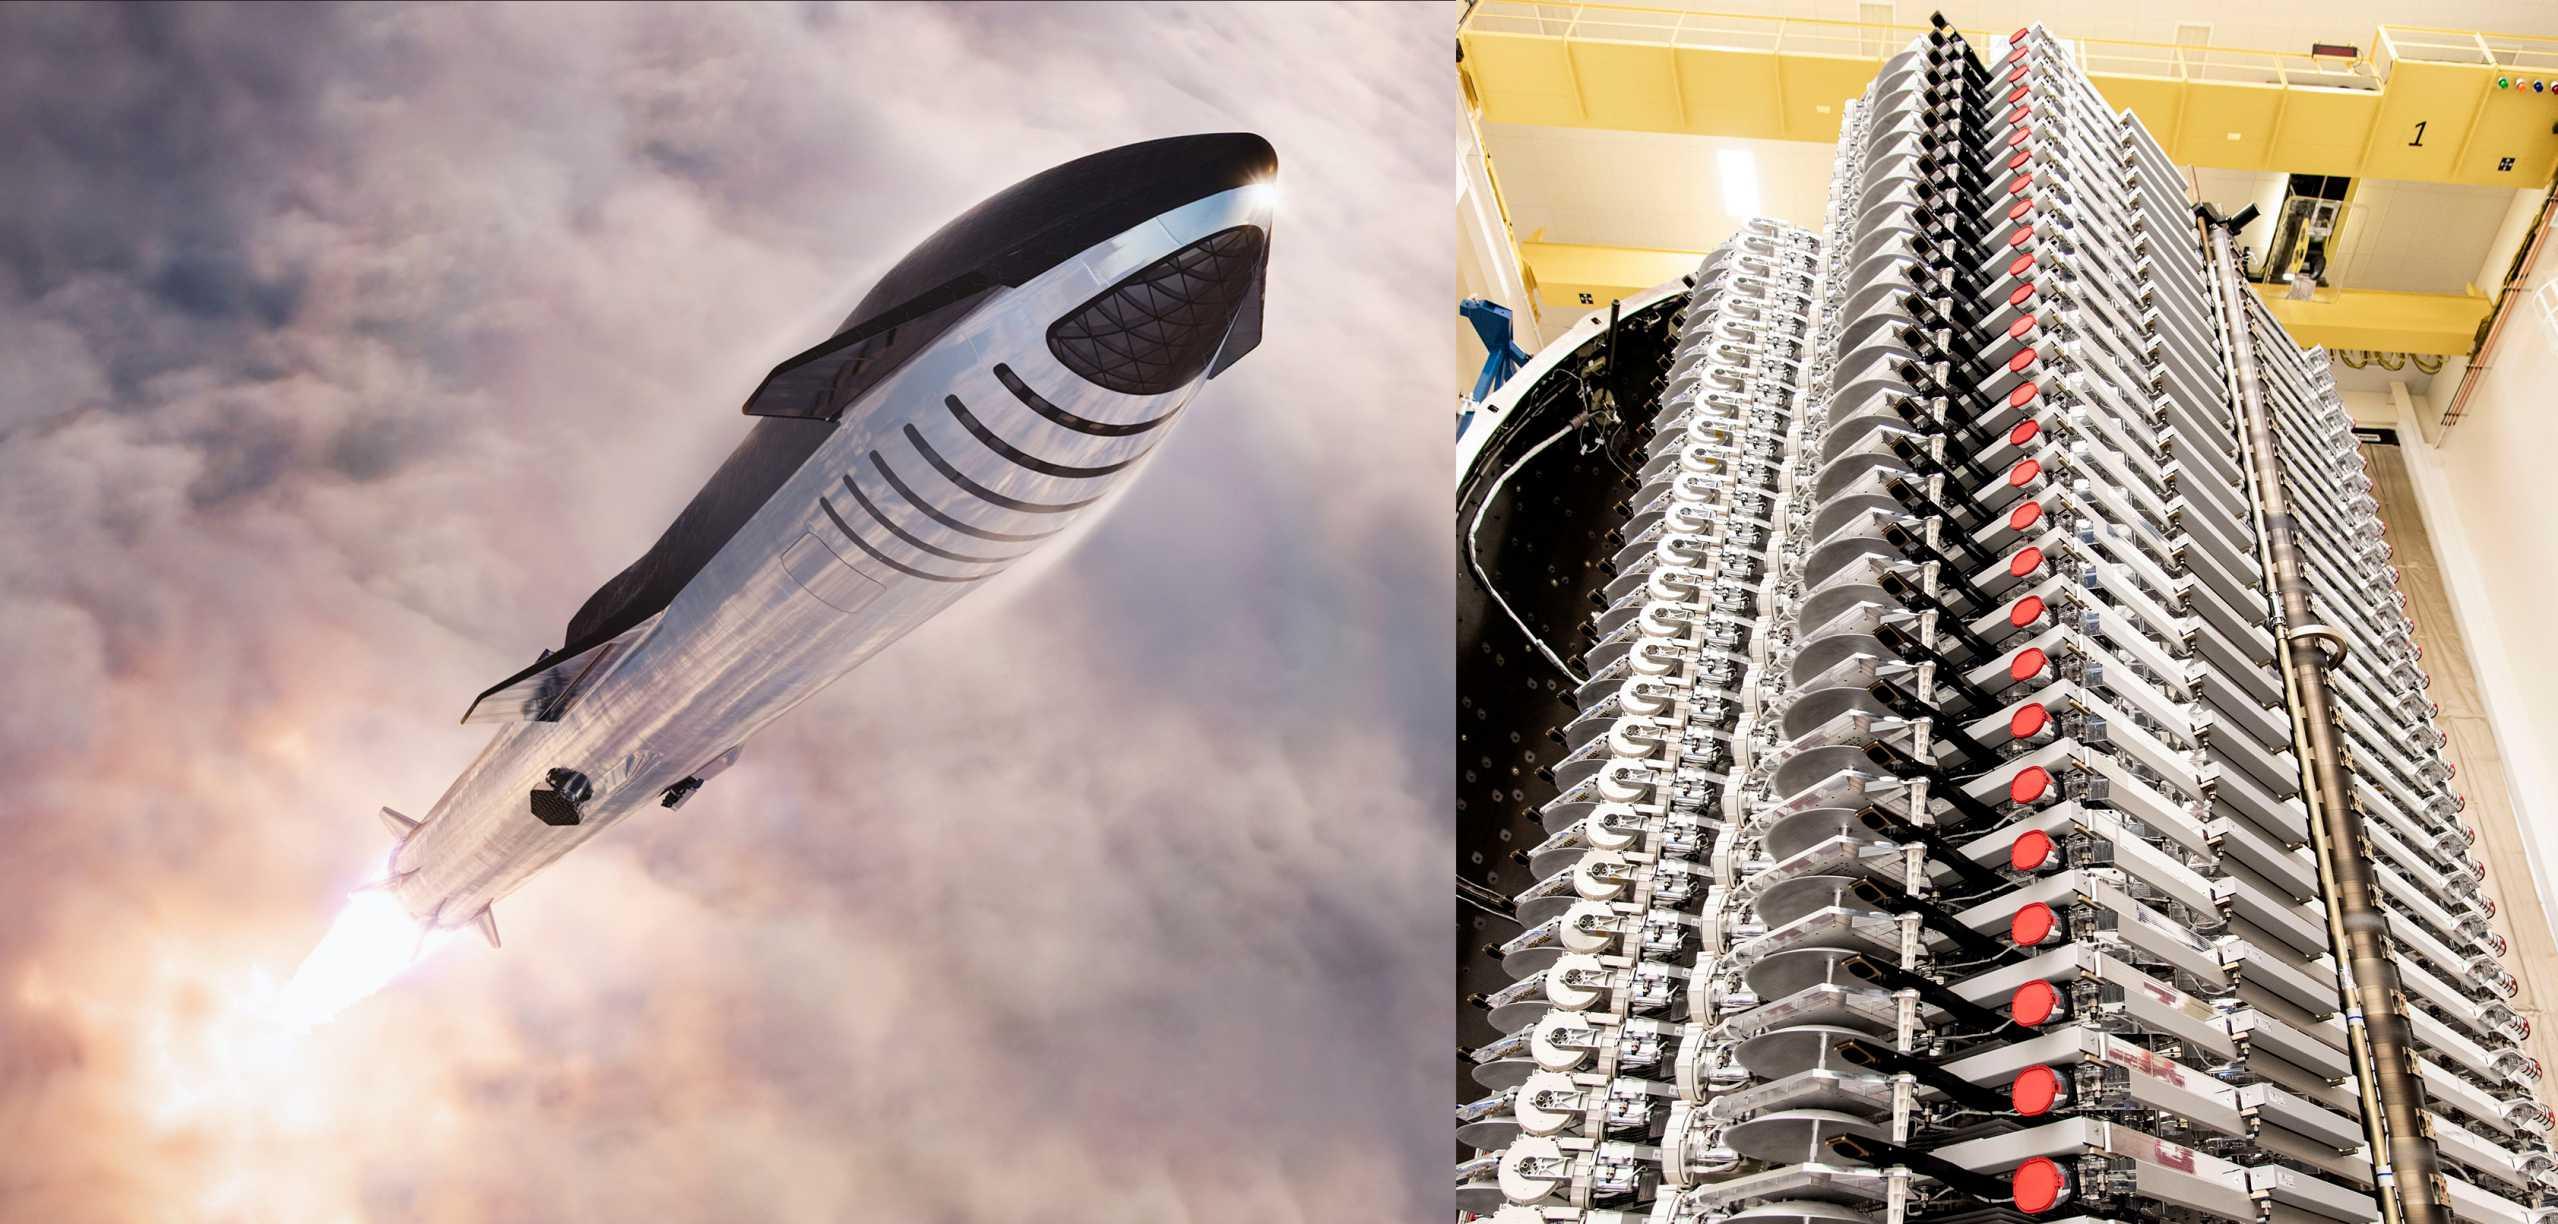 Starship Super Heavy + Starlink (SpaceX) 1 (c)